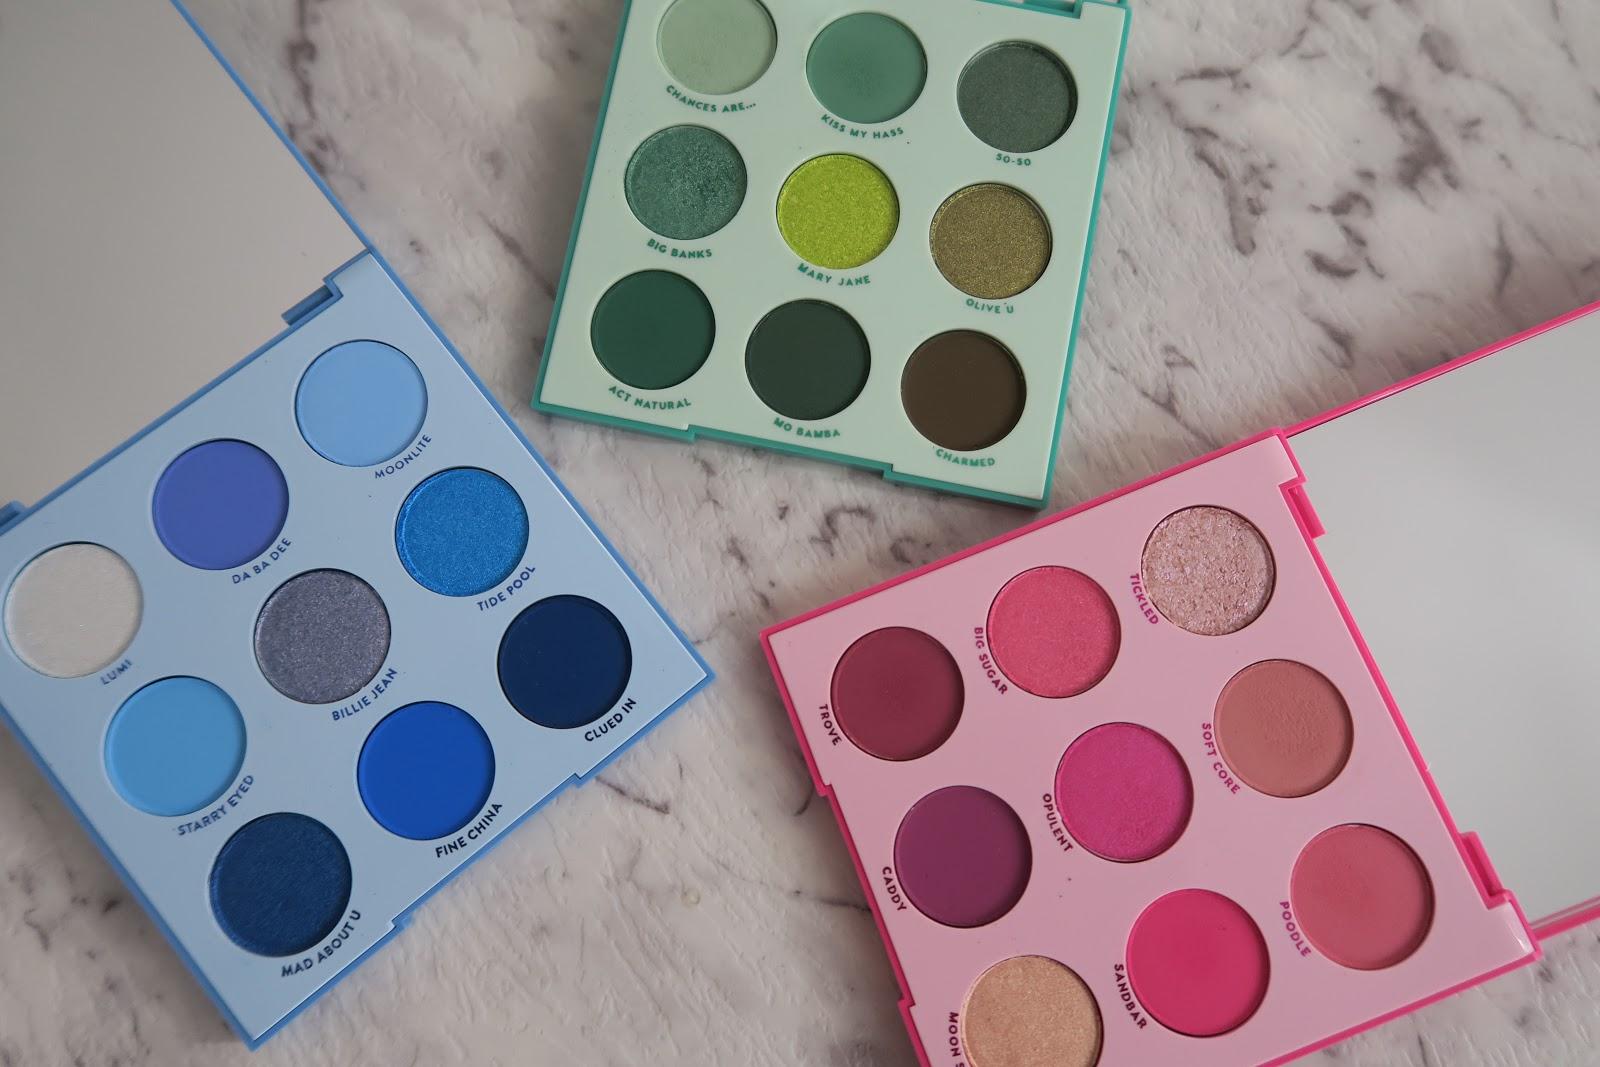 Blue Moon Eyeshadow Palette  by Colourpop #16